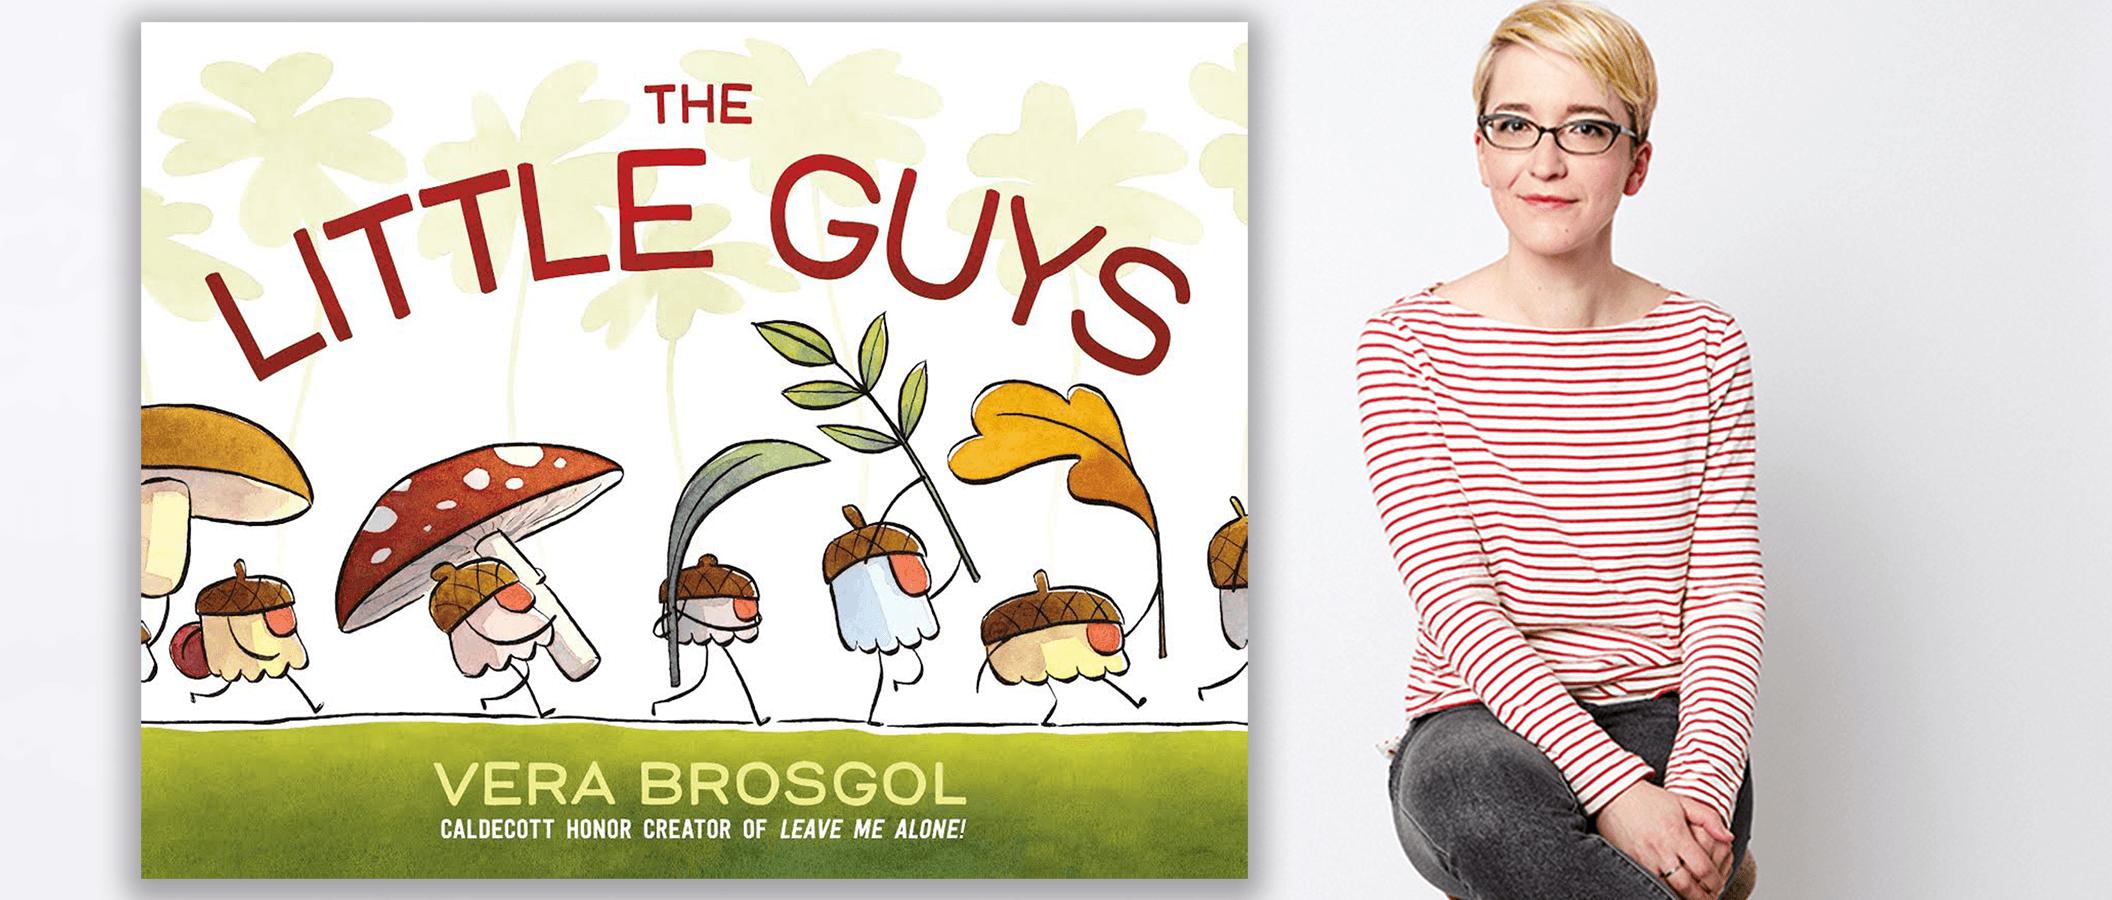 The Little Guys by Vera Brosgol